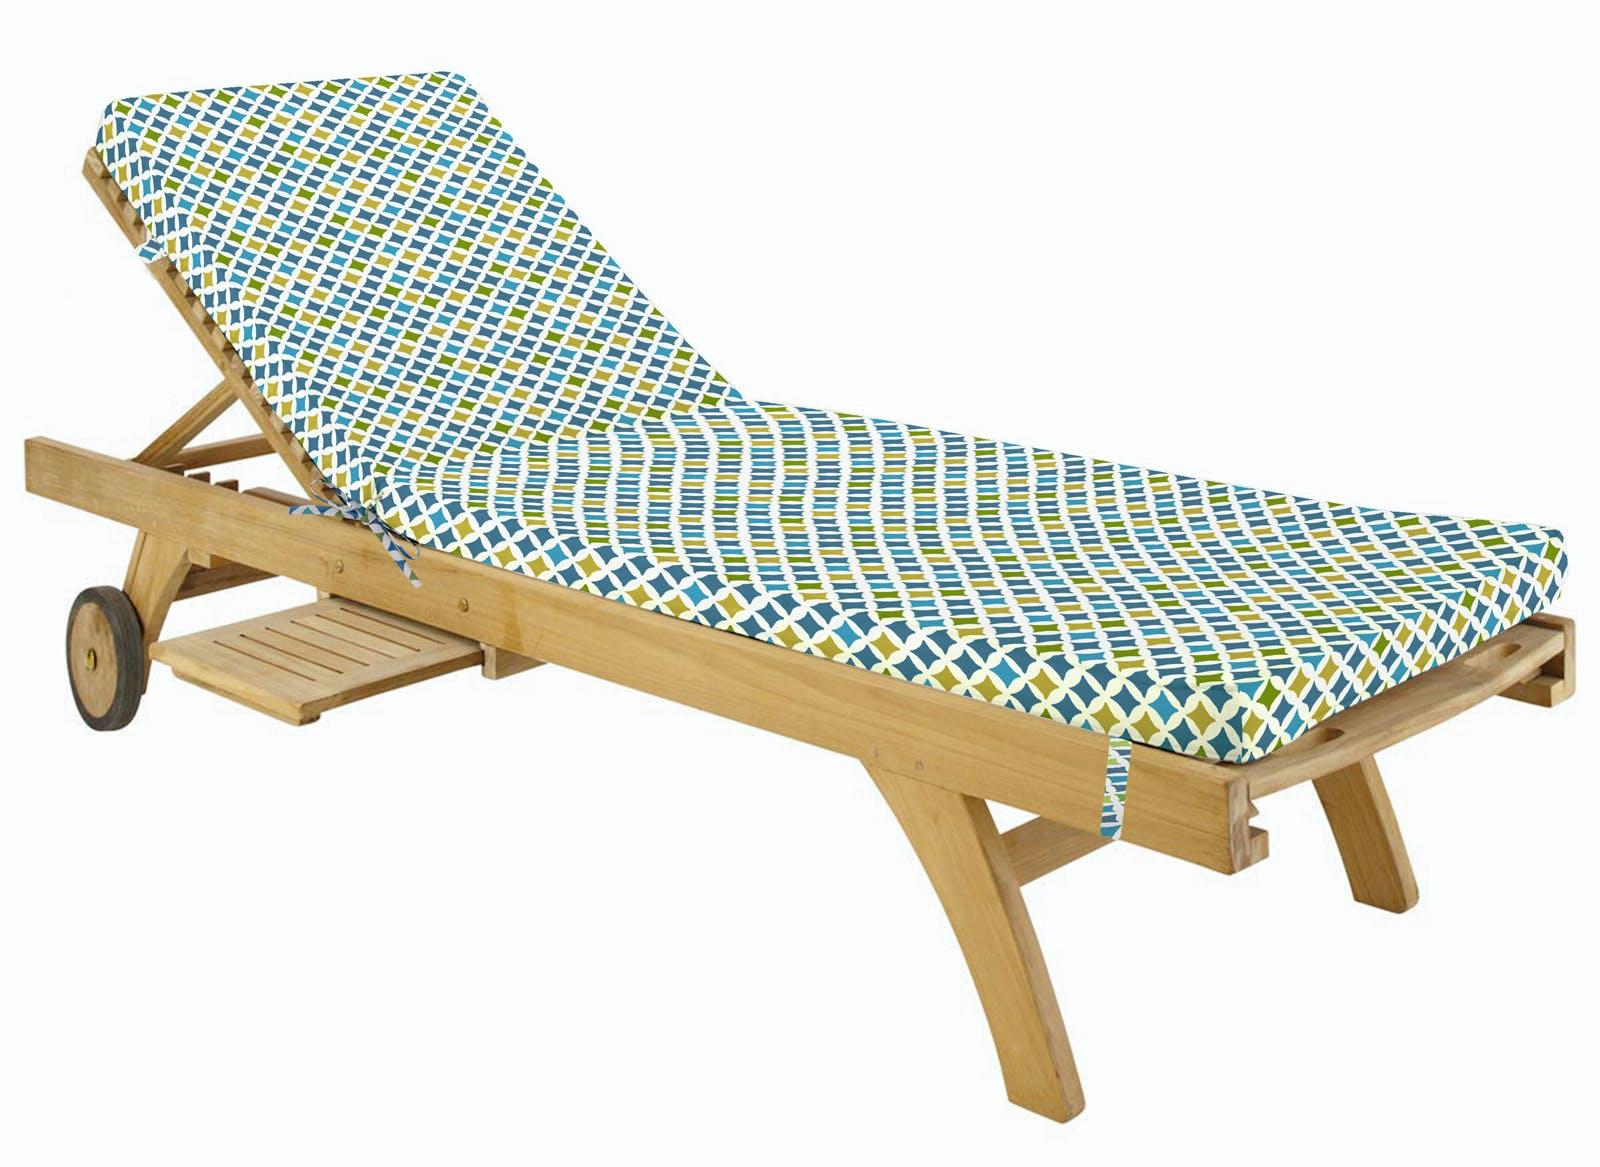 Matelas bain de soleil multicolore en coton 55x180cm TAMARI